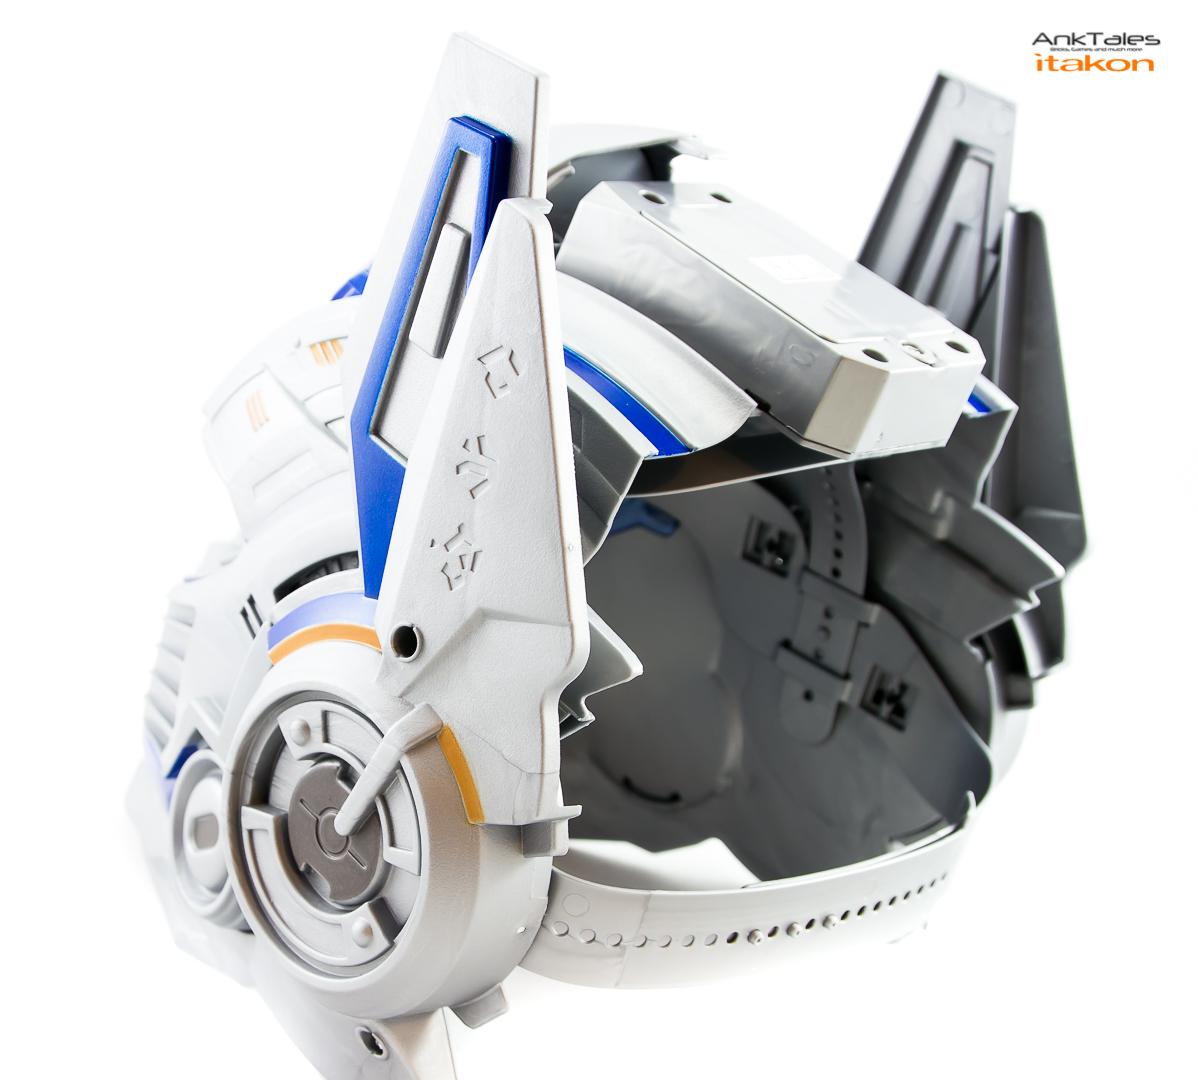 Link a Hasbro Optimus Prime helmet Anktales Itakon_0019